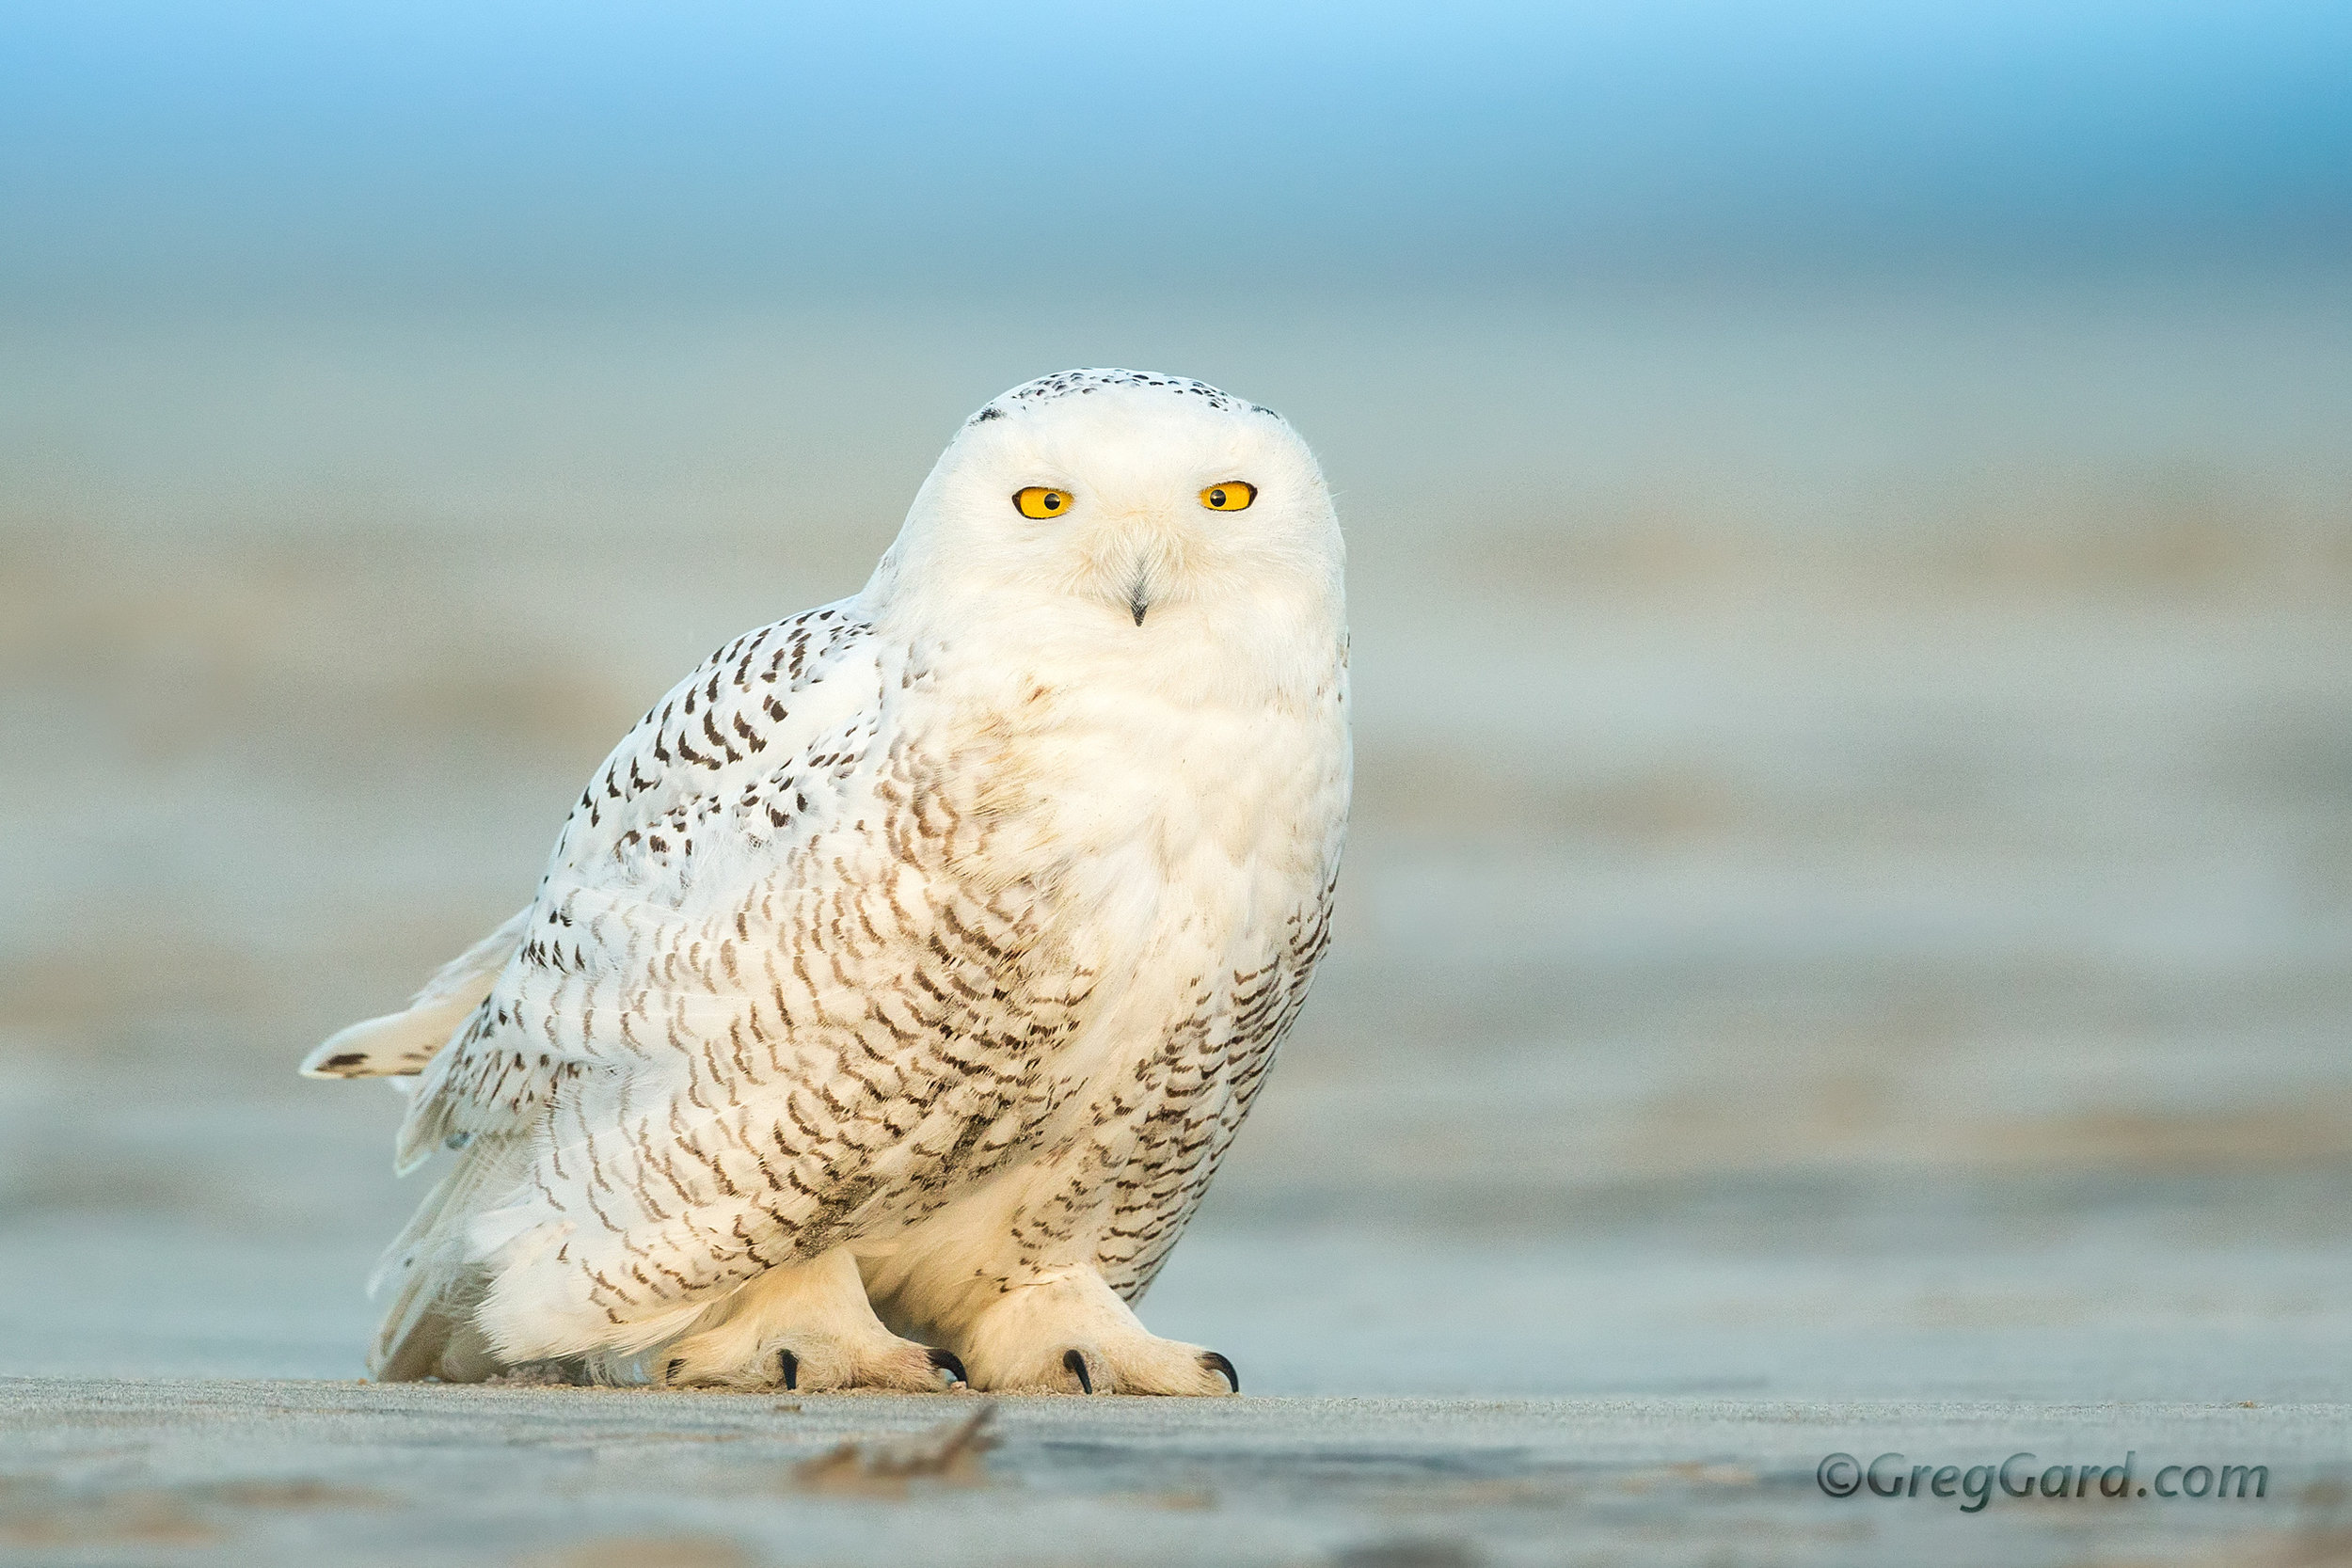 Snowy Owl standing on the beach